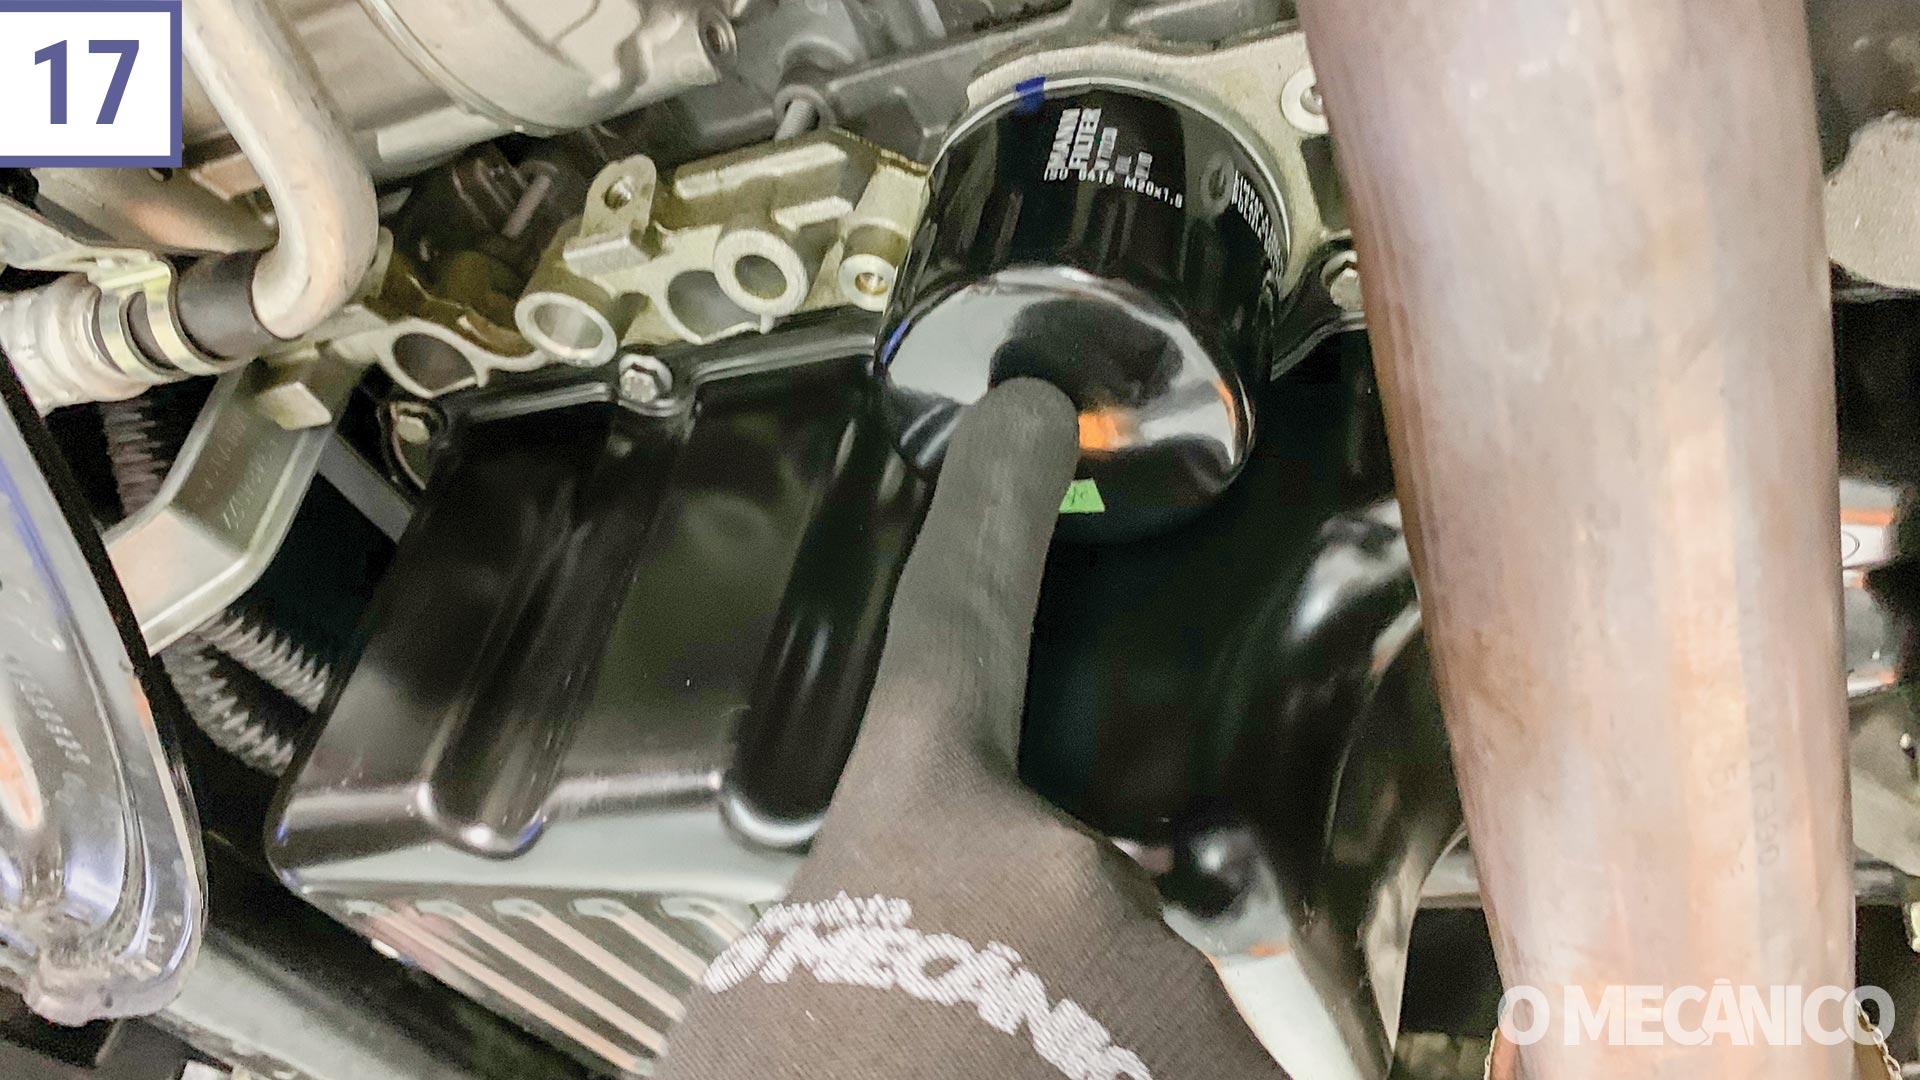 Raio X: Fiat Toro 1.3 2022